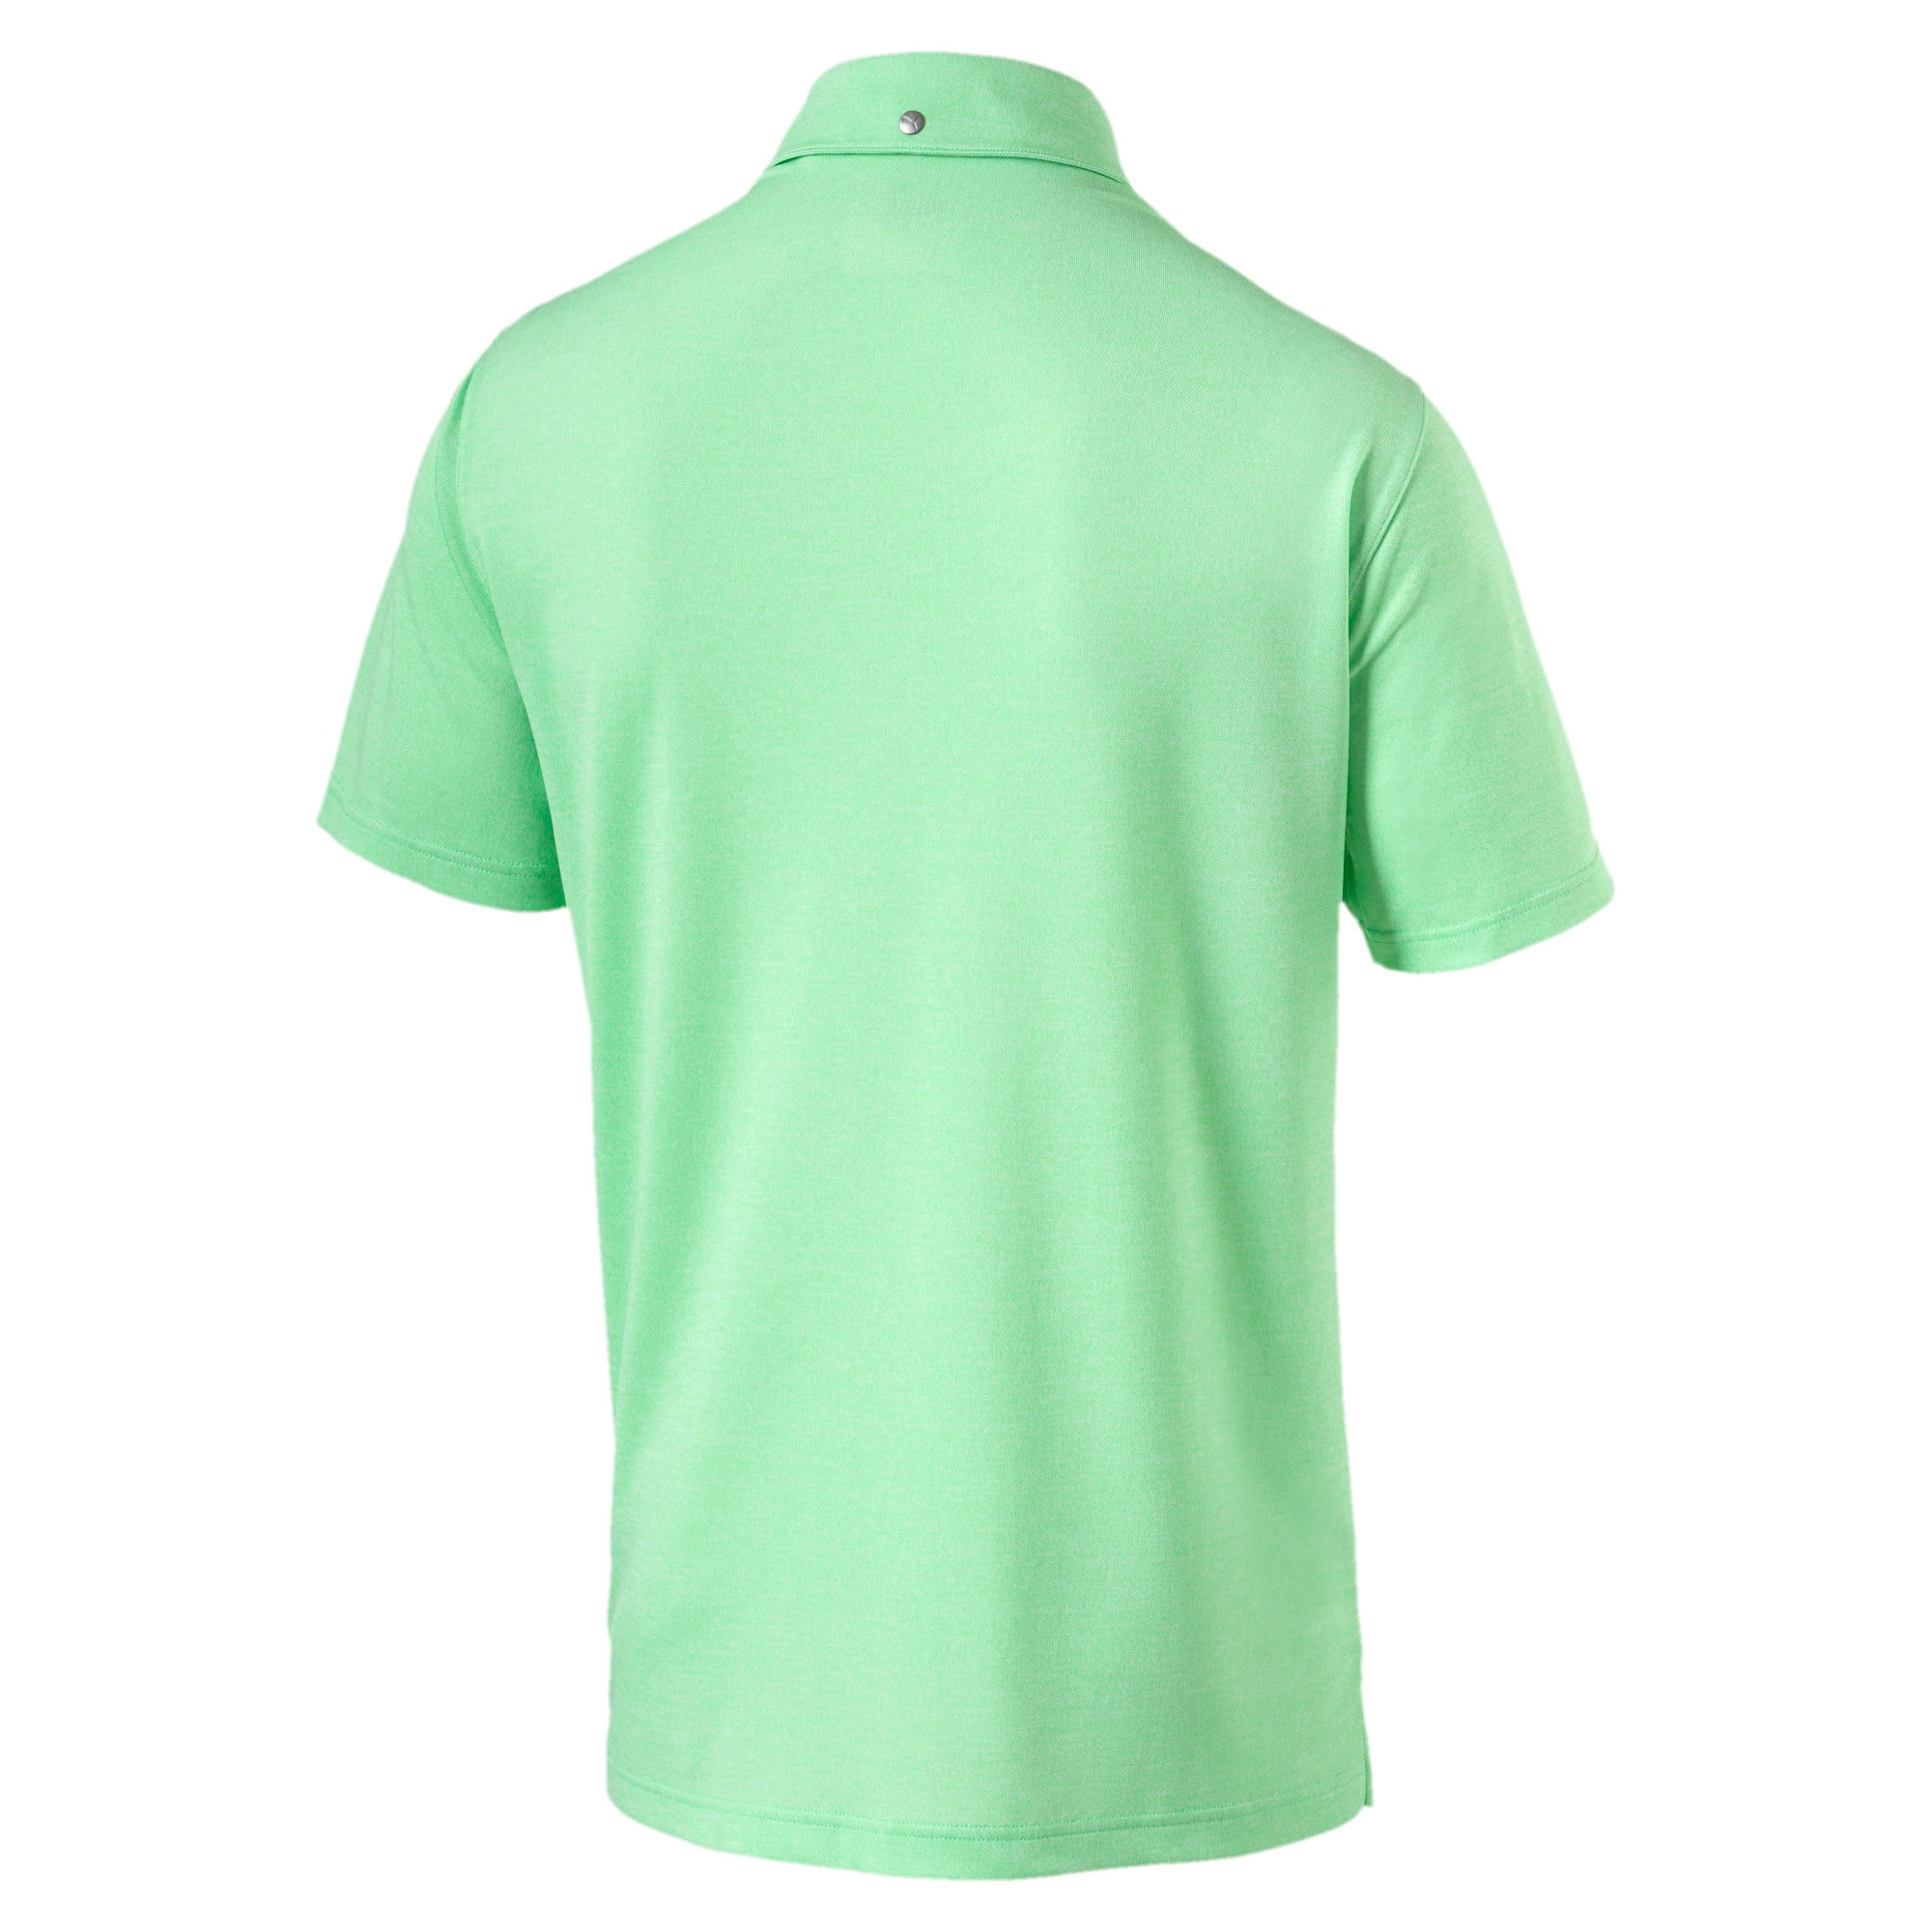 Thumbnail 4 of Grill to Green Men's Golf Polo, Irish Green Heather, medium-IND